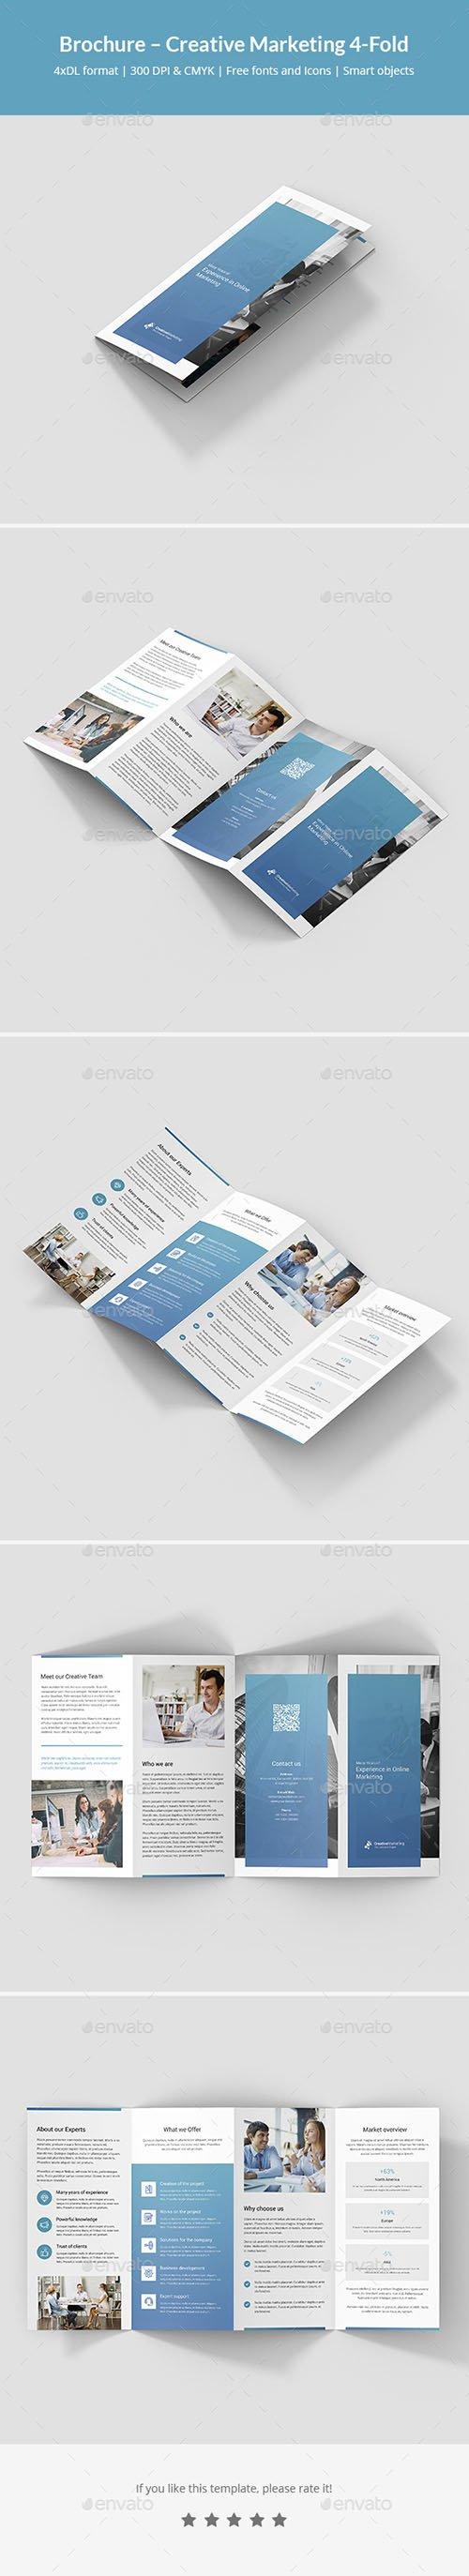 GR - Brochure – Creative Marketing 4-Fold 21487774